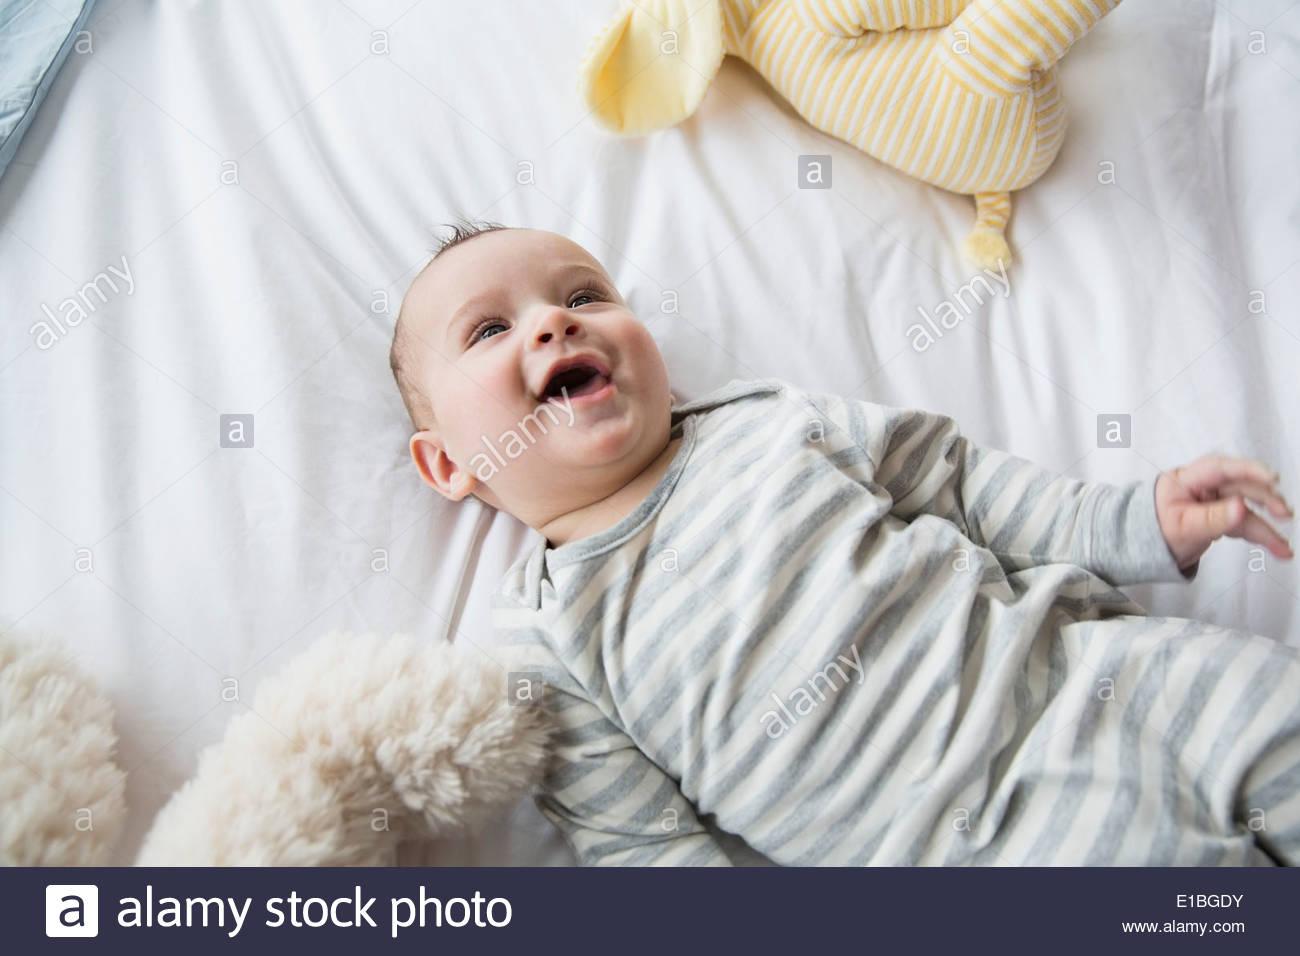 Lachendes Baby auf Bett Stockbild